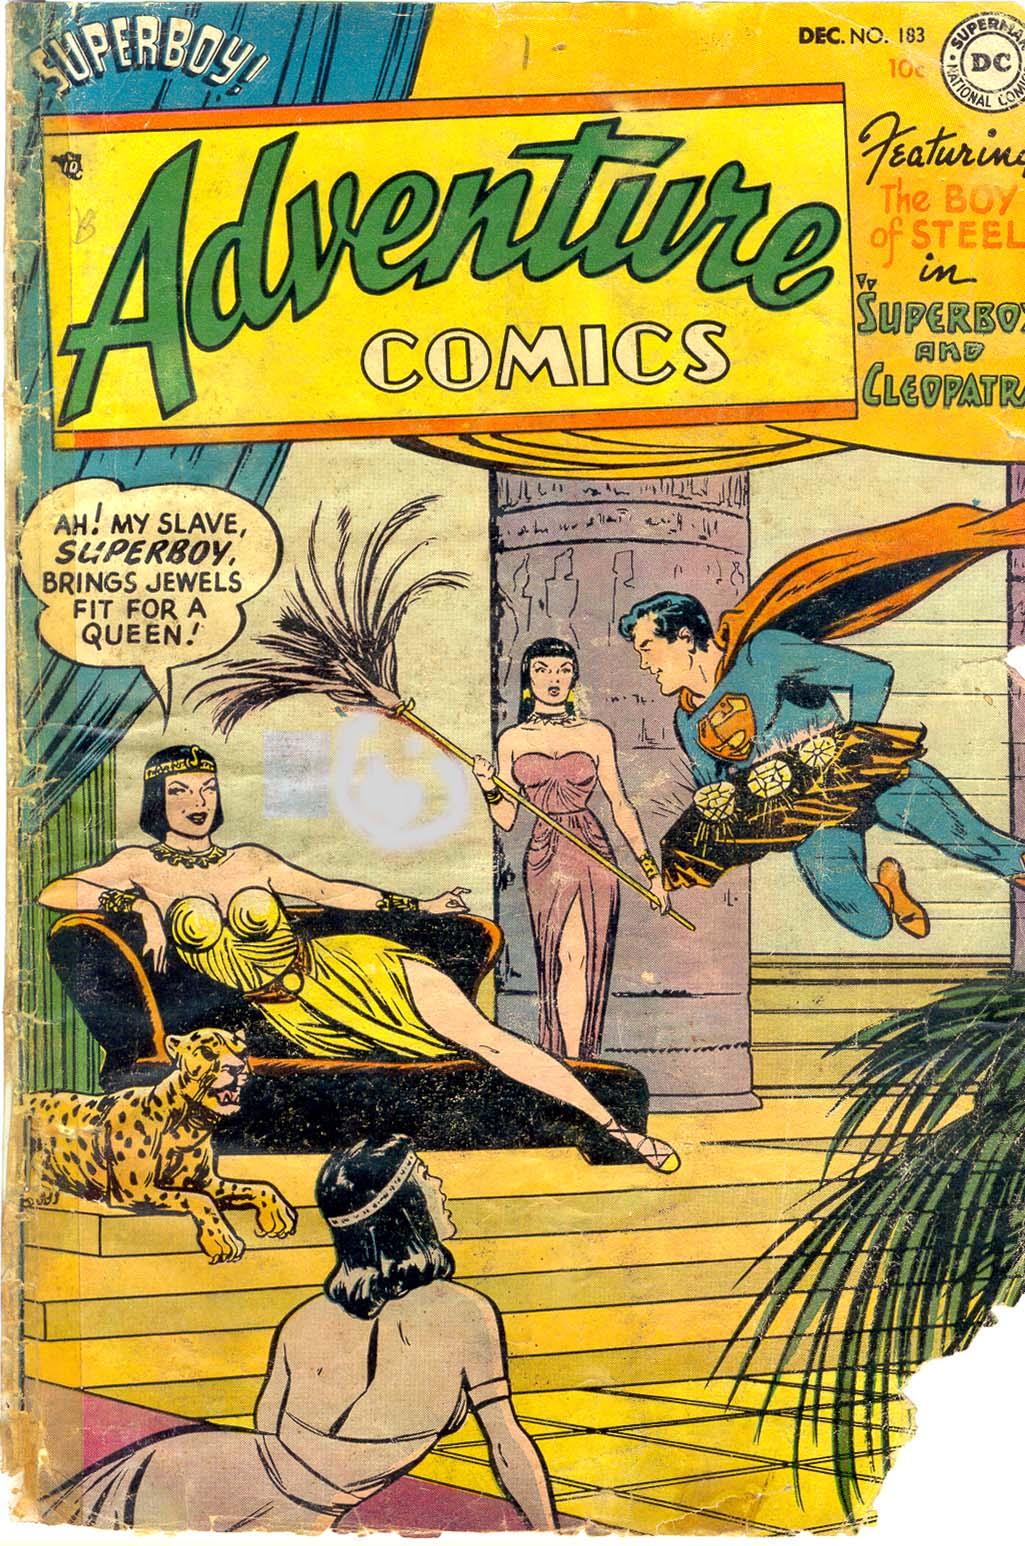 Read online Adventure Comics (1938) comic -  Issue #183 - 1